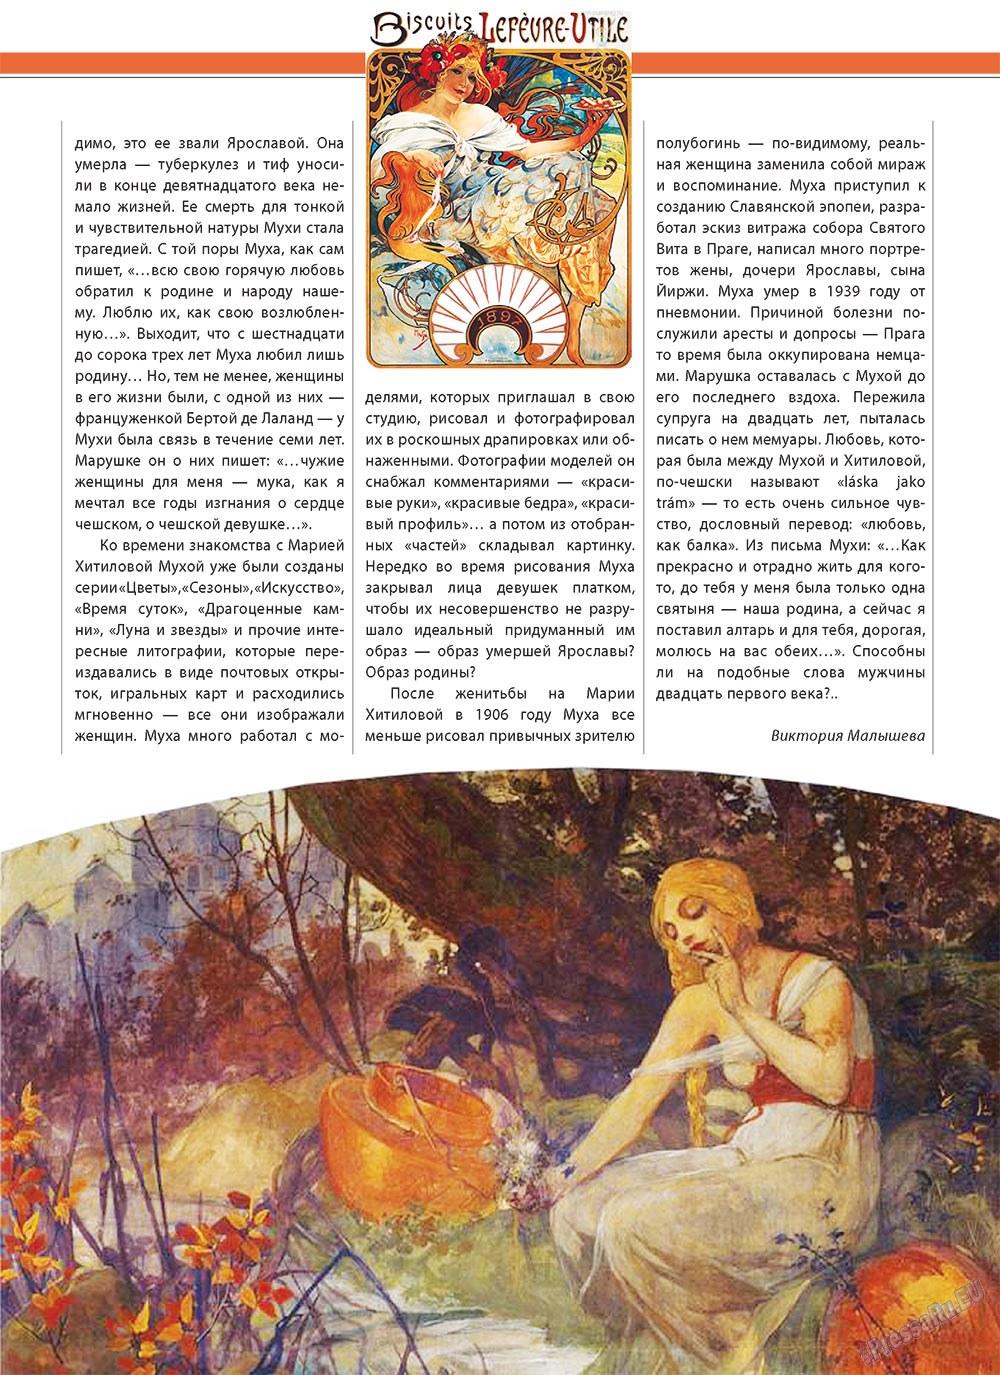 Артек (журнал). 2010 год, номер 6, стр. 29